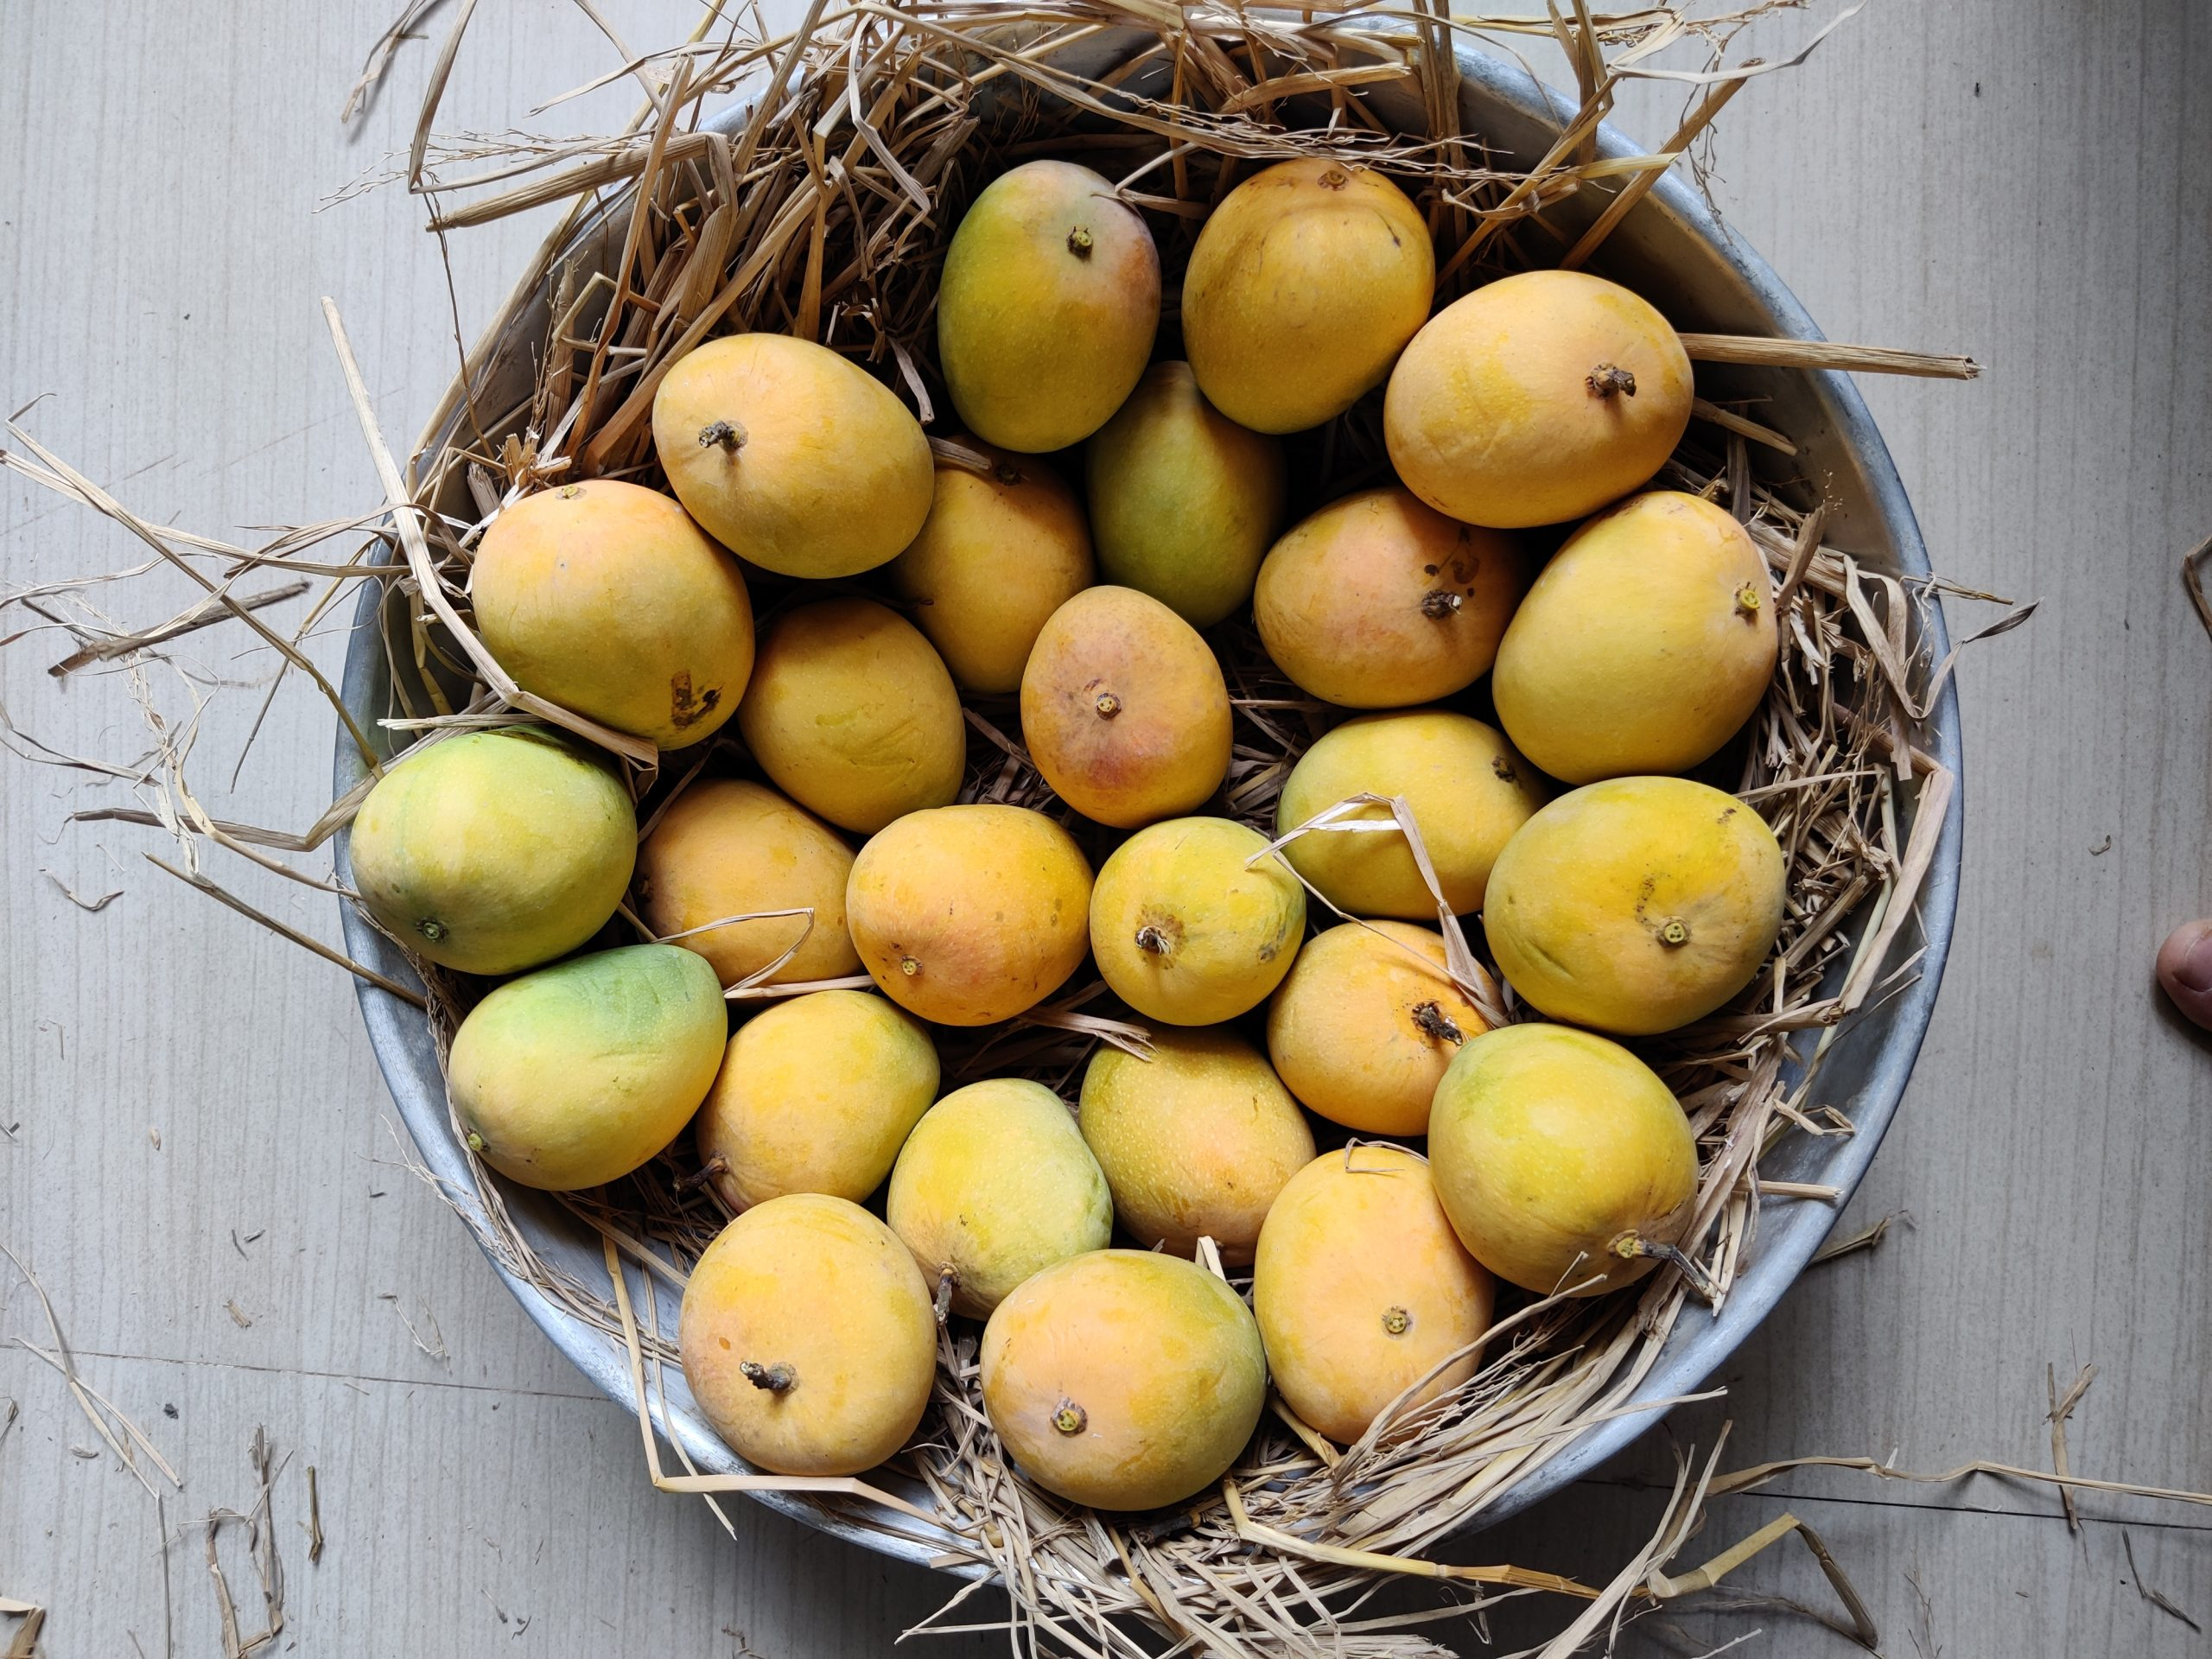 Ripe mangoes in a basket